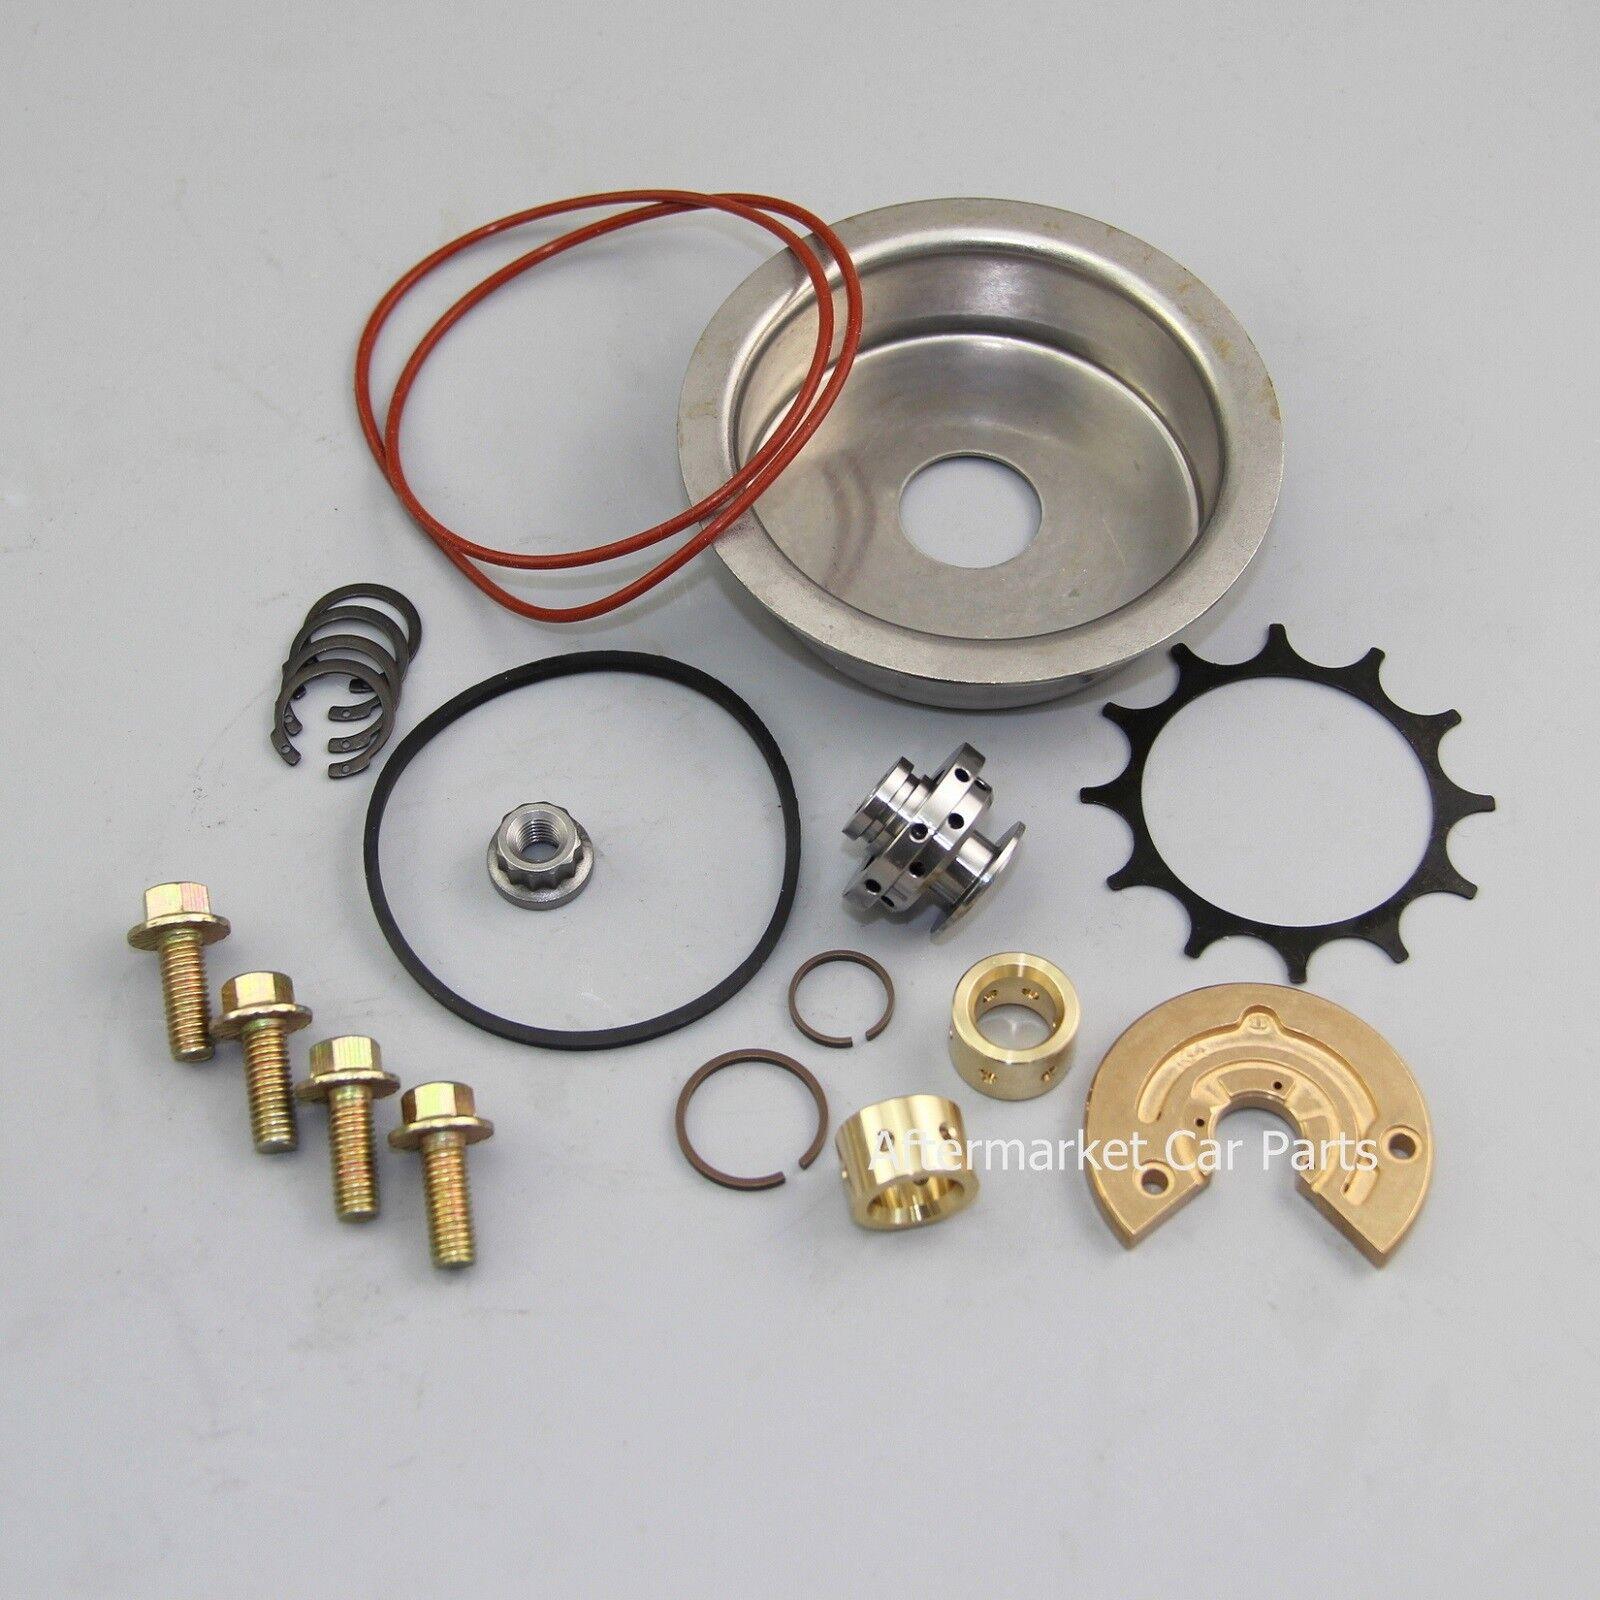 labwork Turbo Charger Rebuild Repair Kit Fit for Garrett T3T4 T3 T4 T04E TB03 TC03 T04B Thrust Journal Bearing Spring Turbine O-Ring